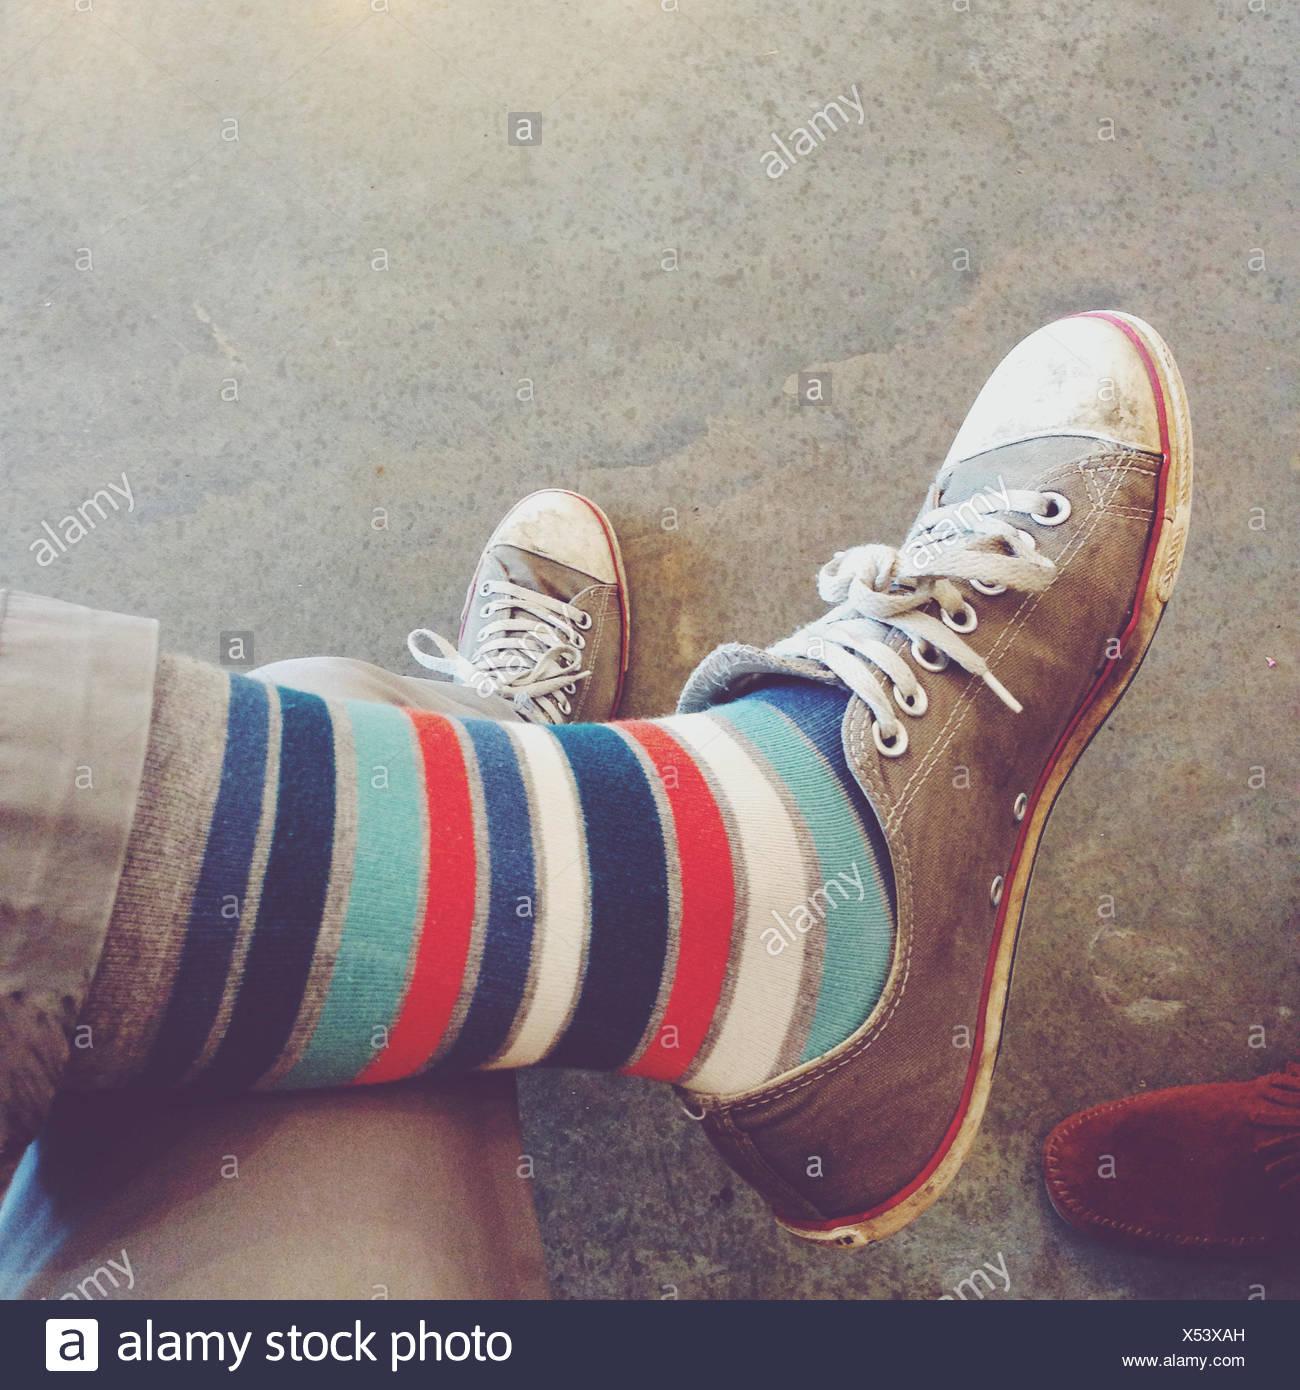 USA, Tennessee, Davidson County, Nashville, Legs in crazy socks - Stock Image